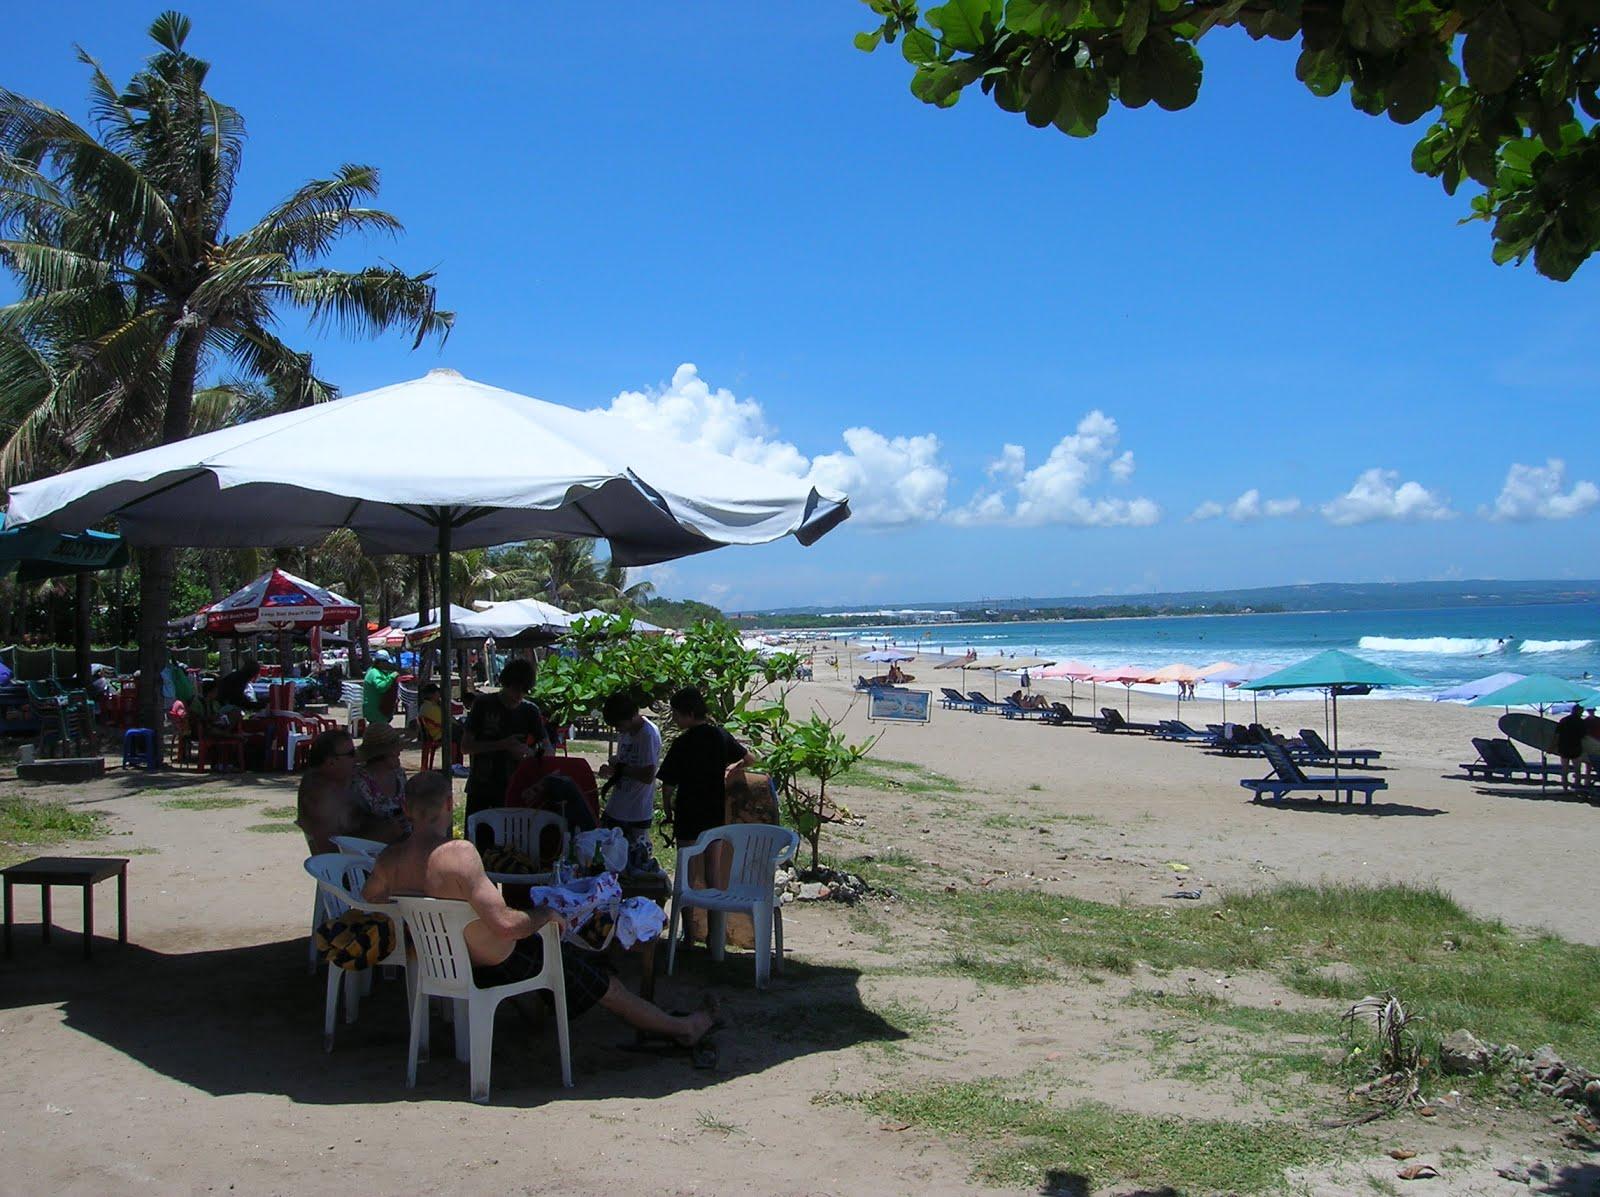 Playa de Legian, Legian, Bali, vuelta al mundo, round the world, La vuelta al mundo de Asun y Ricardo